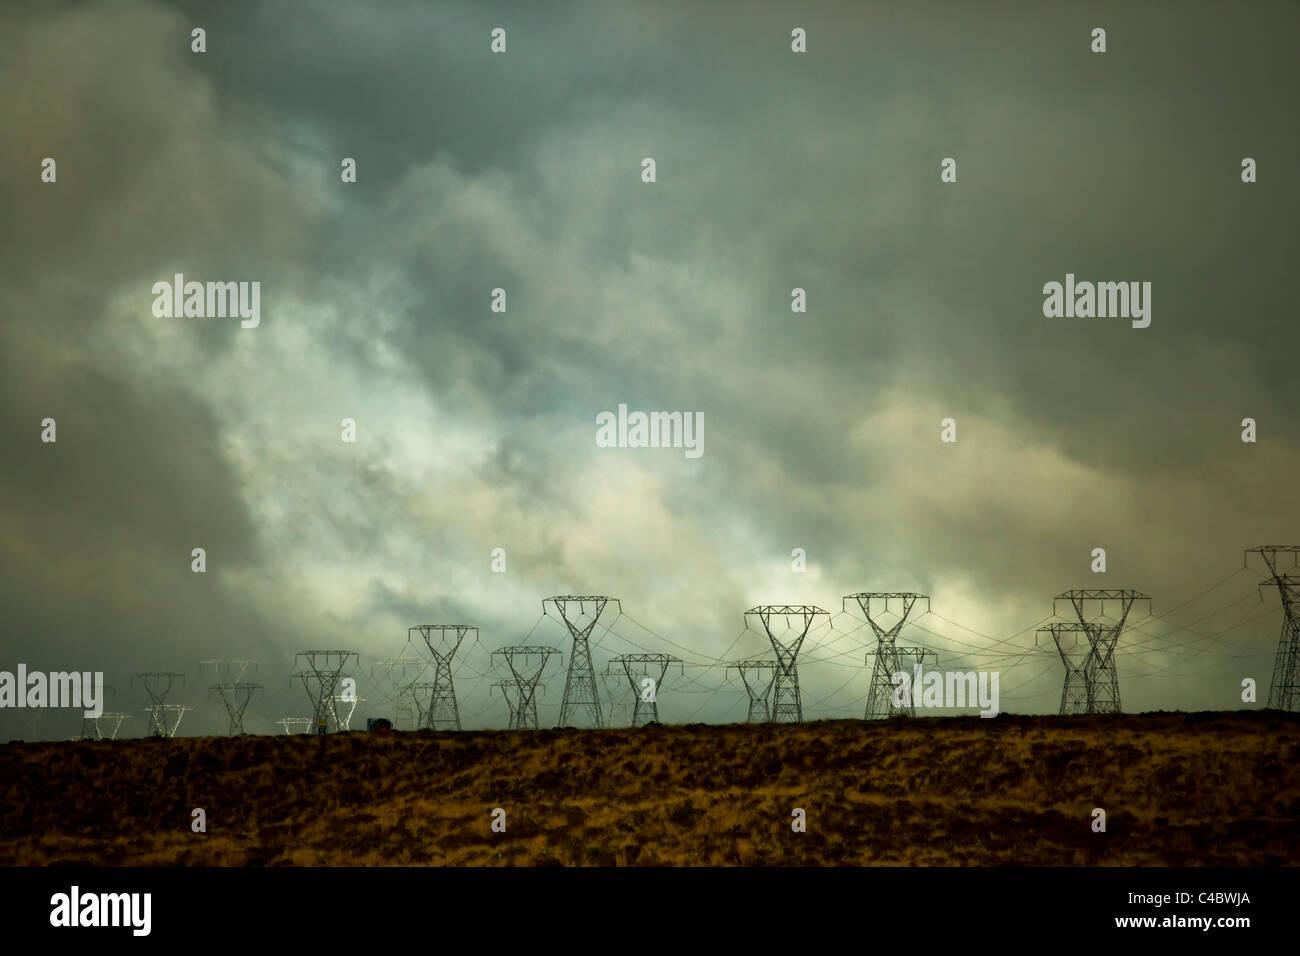 Electricity pylons running alongside state highway one, near Tongariro National park, New Zealand - Stock Image